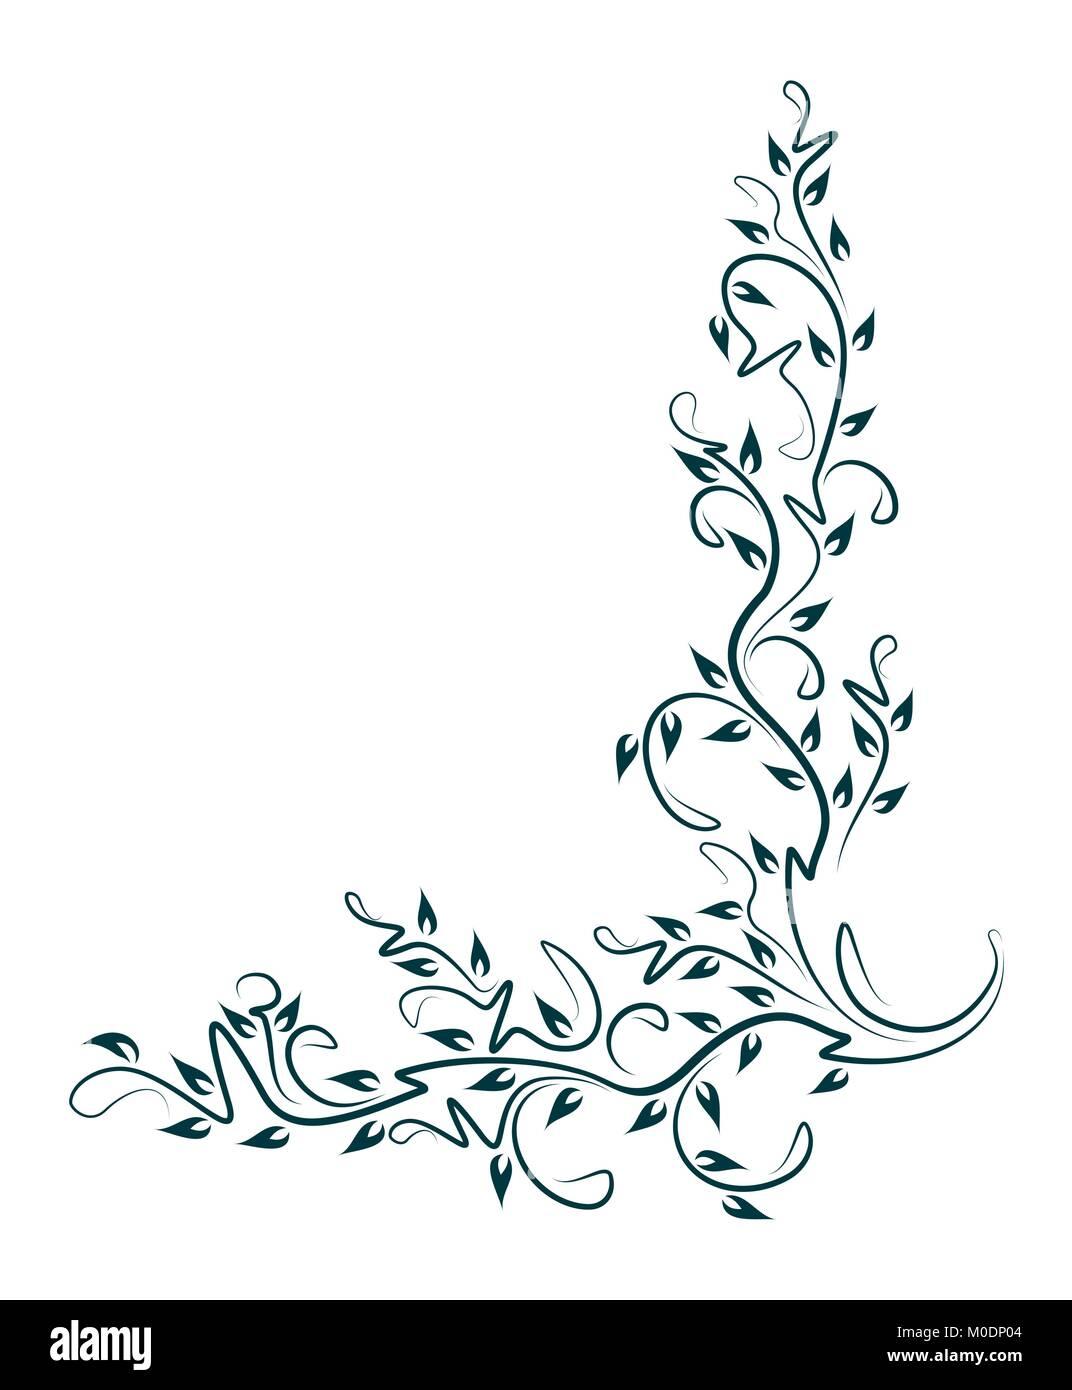 decorative floral corner vector illustration for your design or stock vector image art alamy https www alamy com stock photo decorative floral corner vector illustration for your design or tattoo 172406308 html